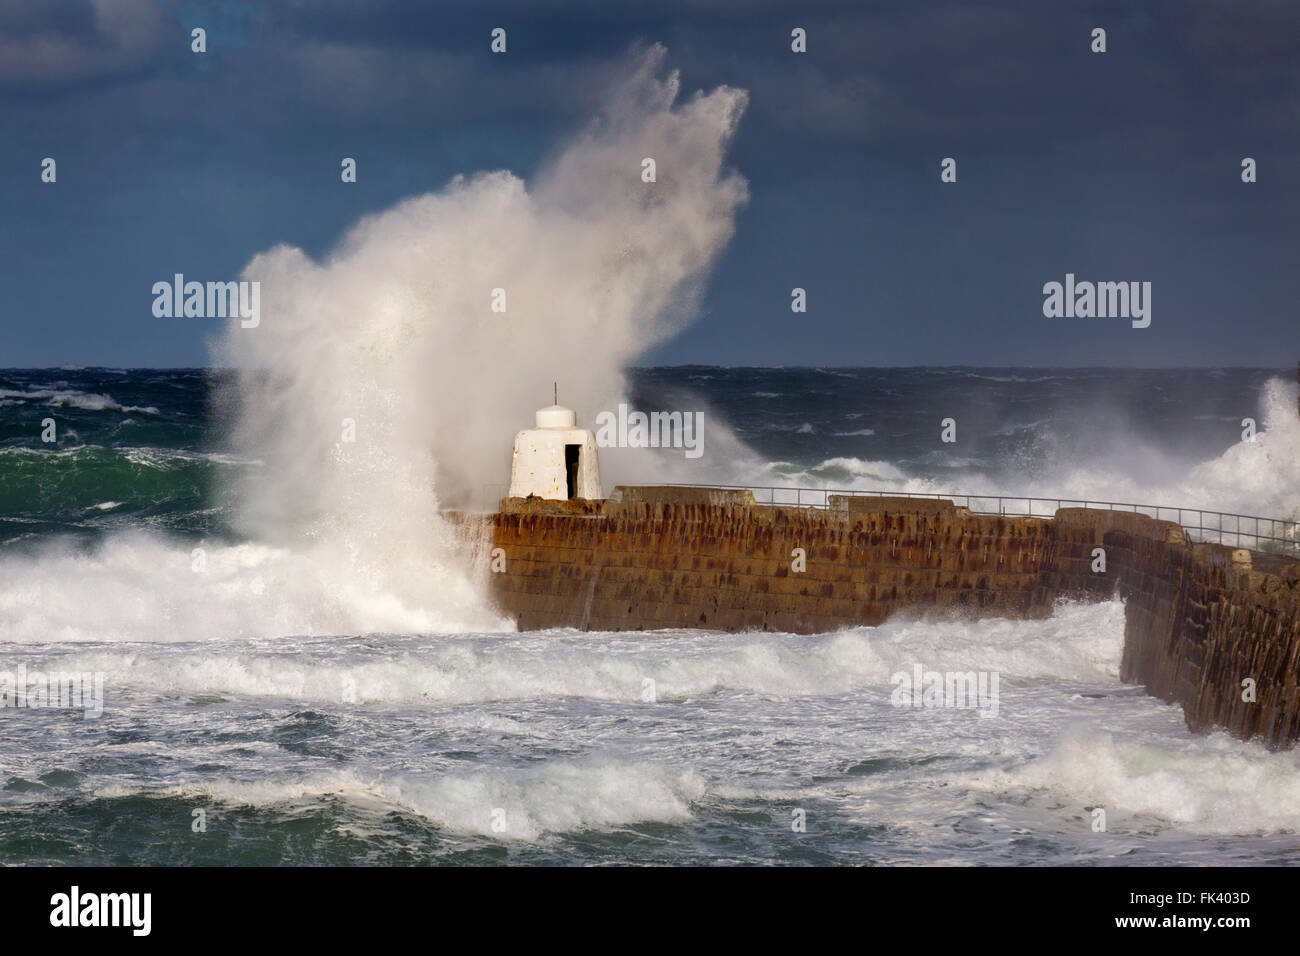 Portreath; Wave breaking Pier; Cornwall; UK - Stock Image